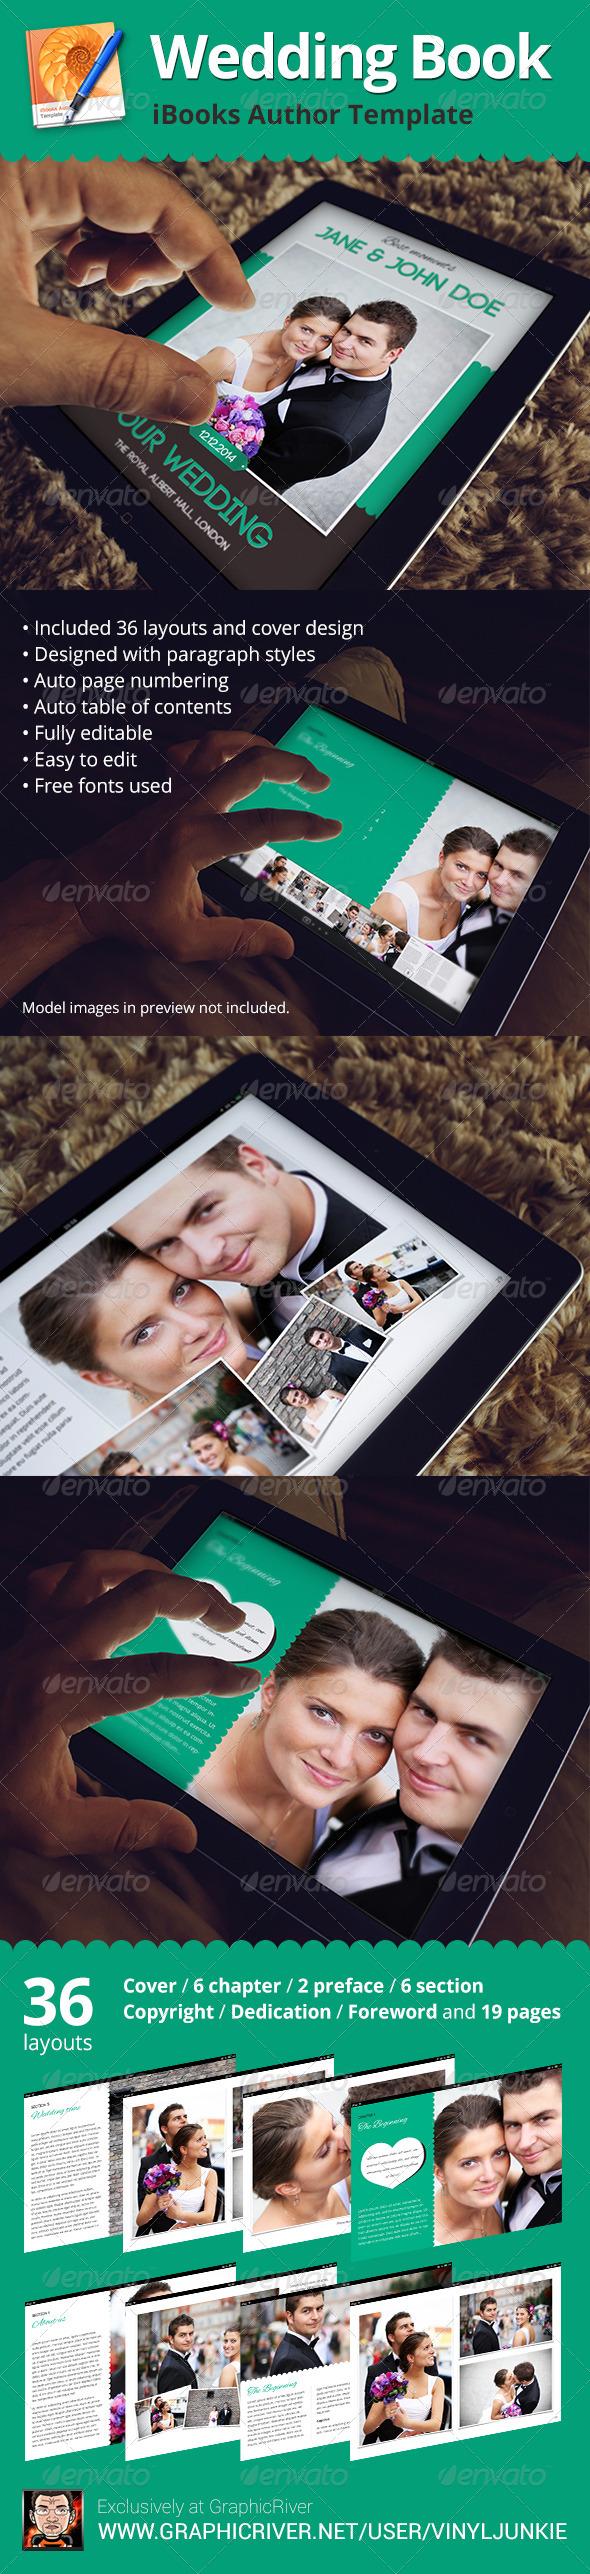 Wedding Book - iBooks Author Template - Digital Books ePublishing